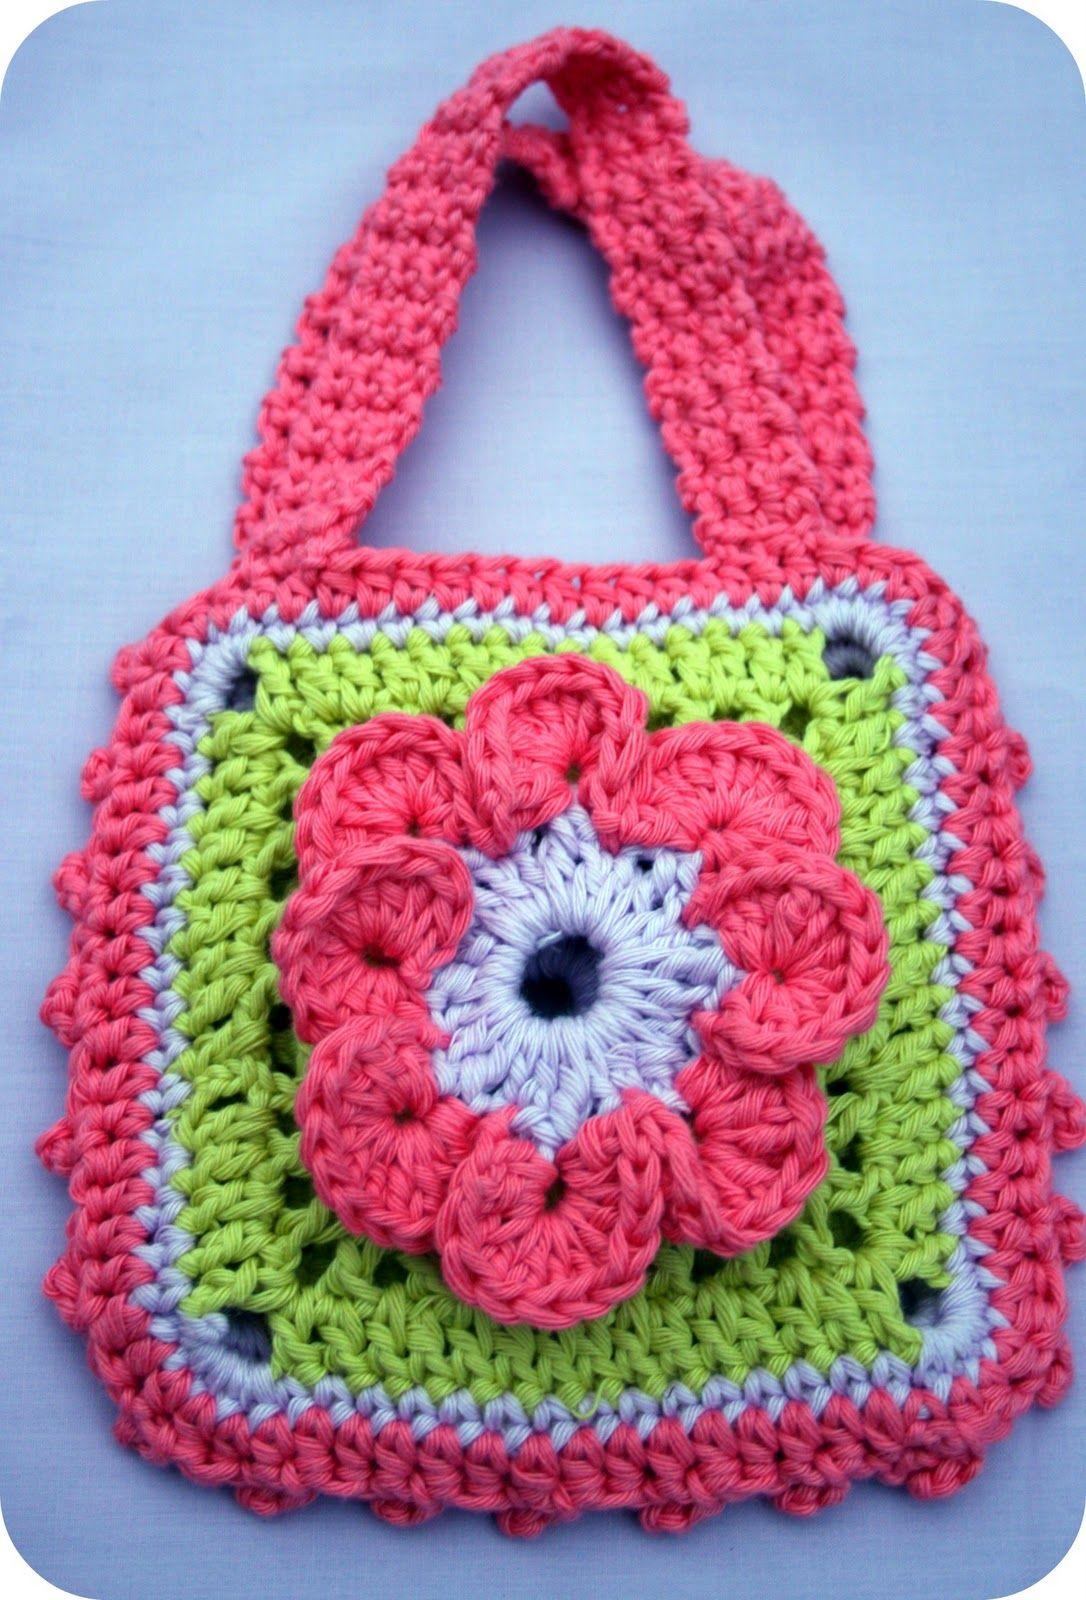 Coffee 'n' crochet: Bloggy love swap treats   Handbag ...